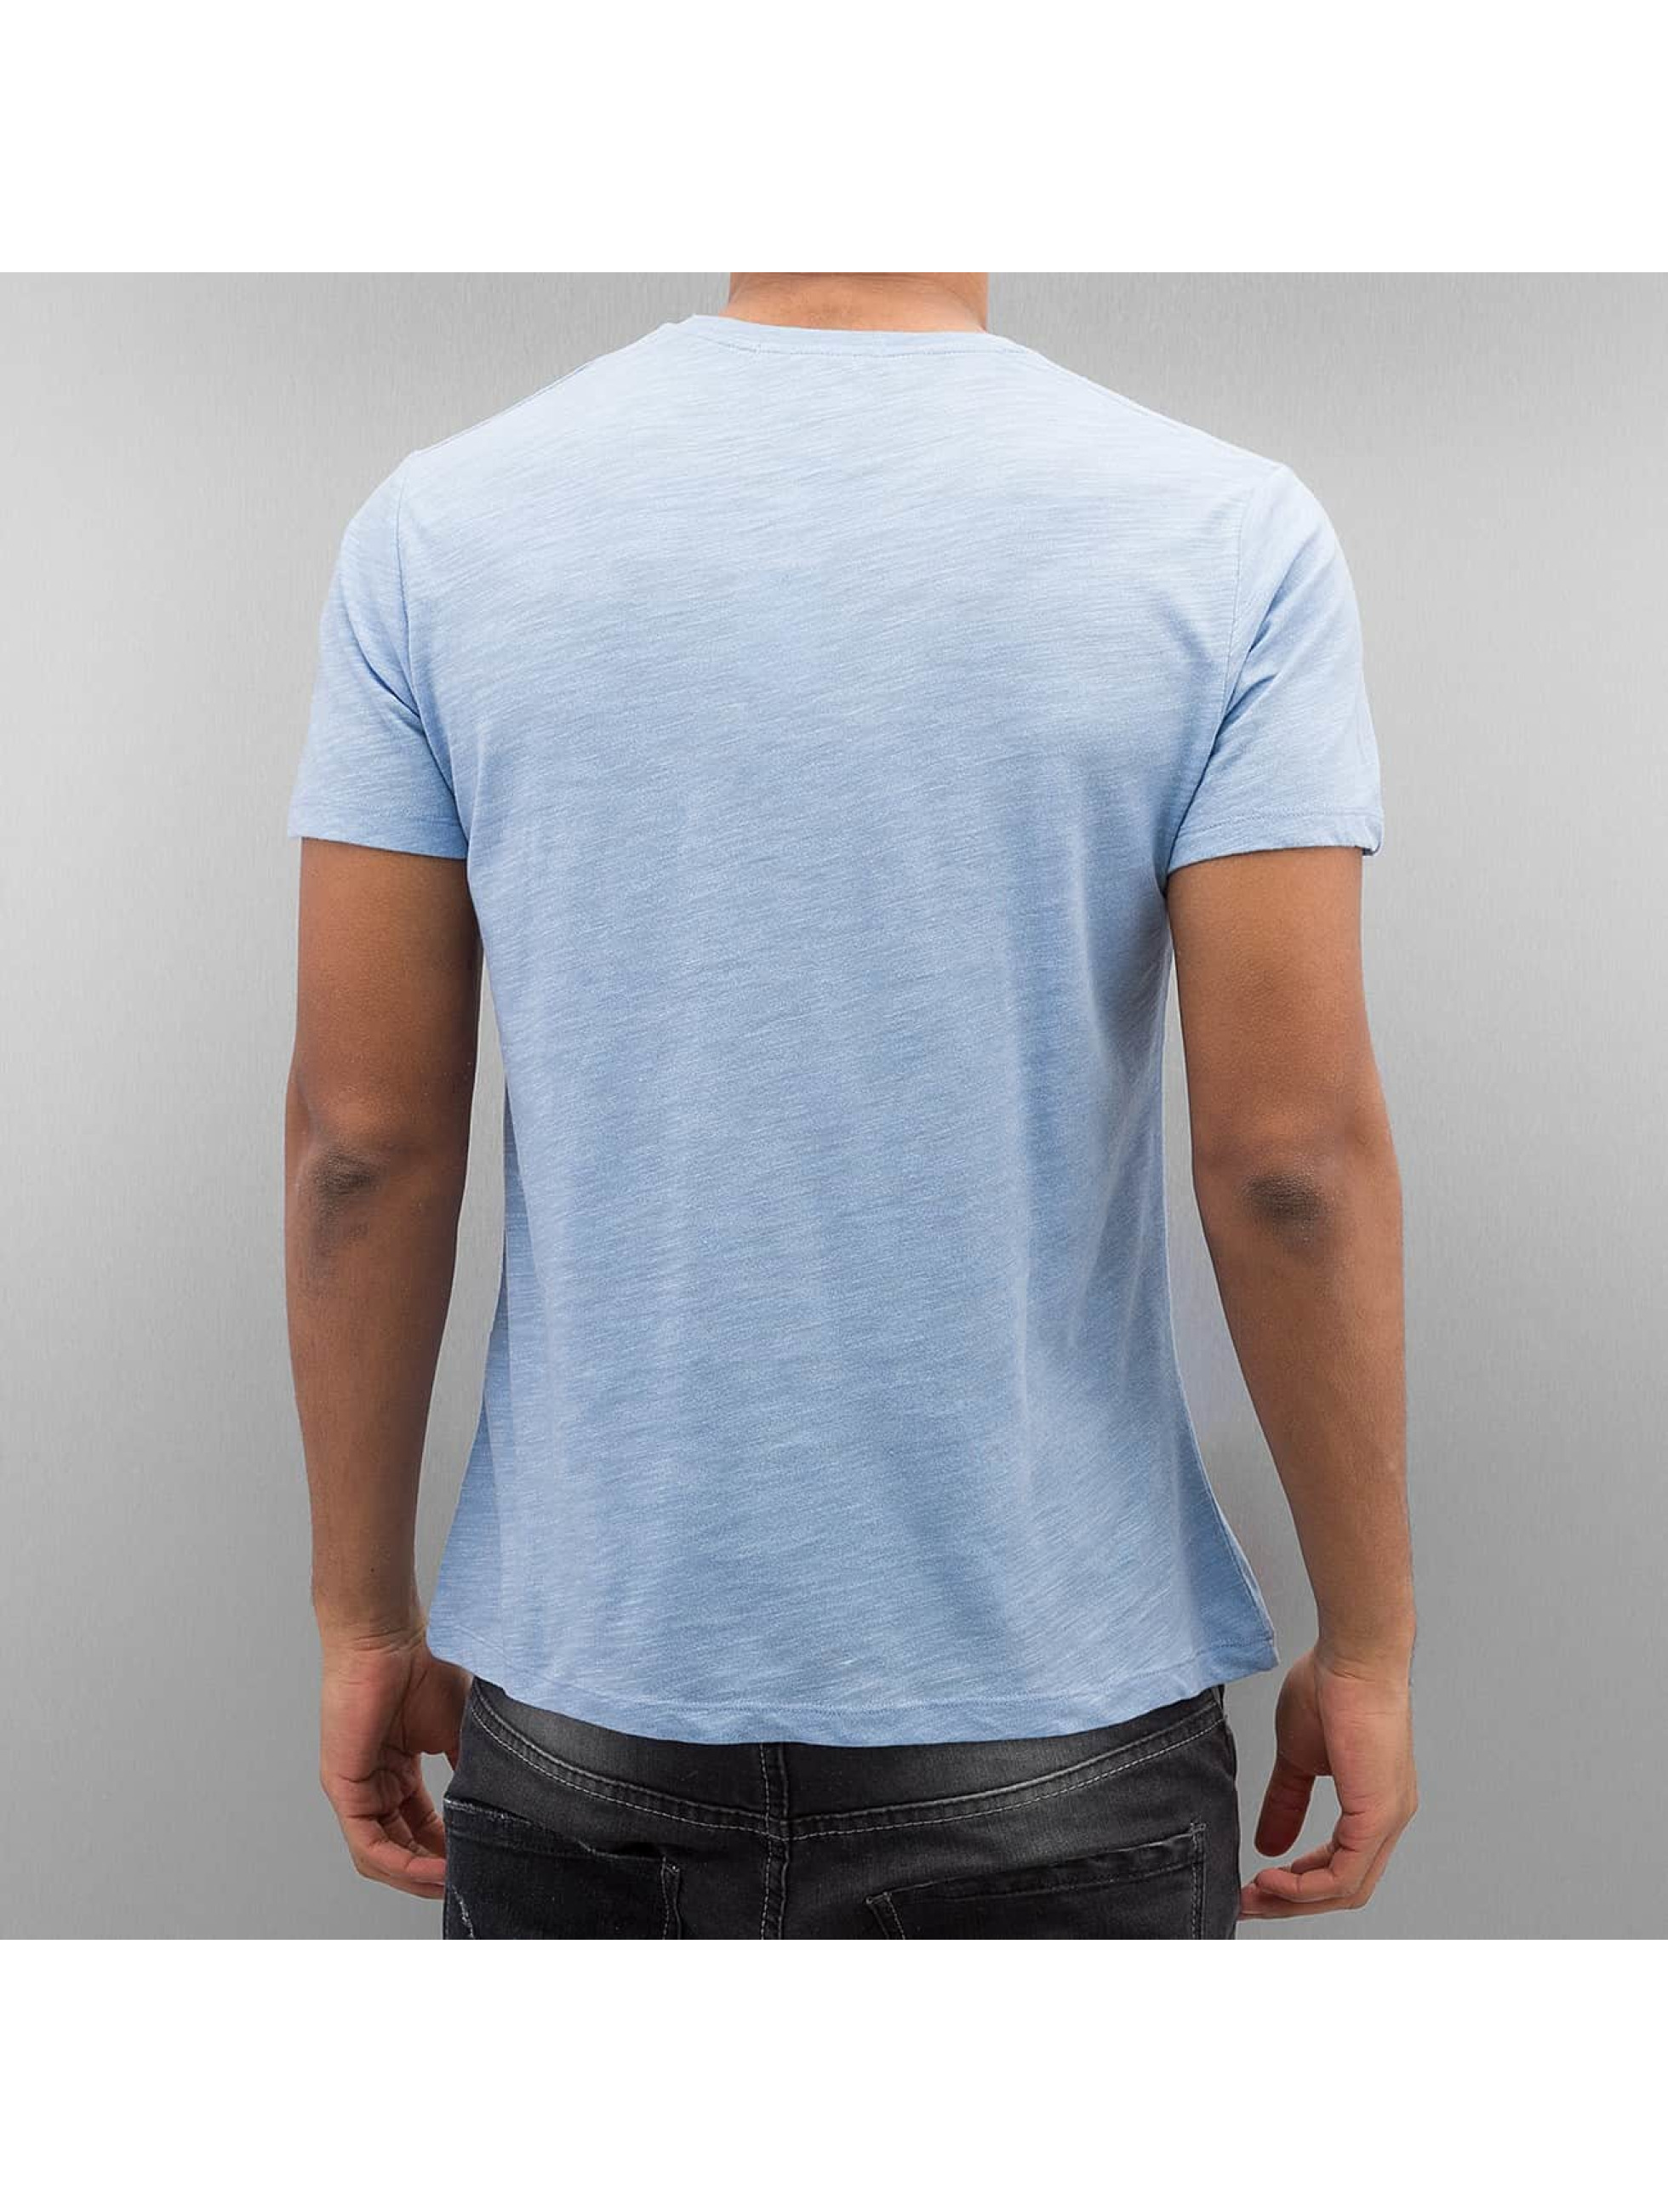 French Kick T-Shirt Olibrius blue